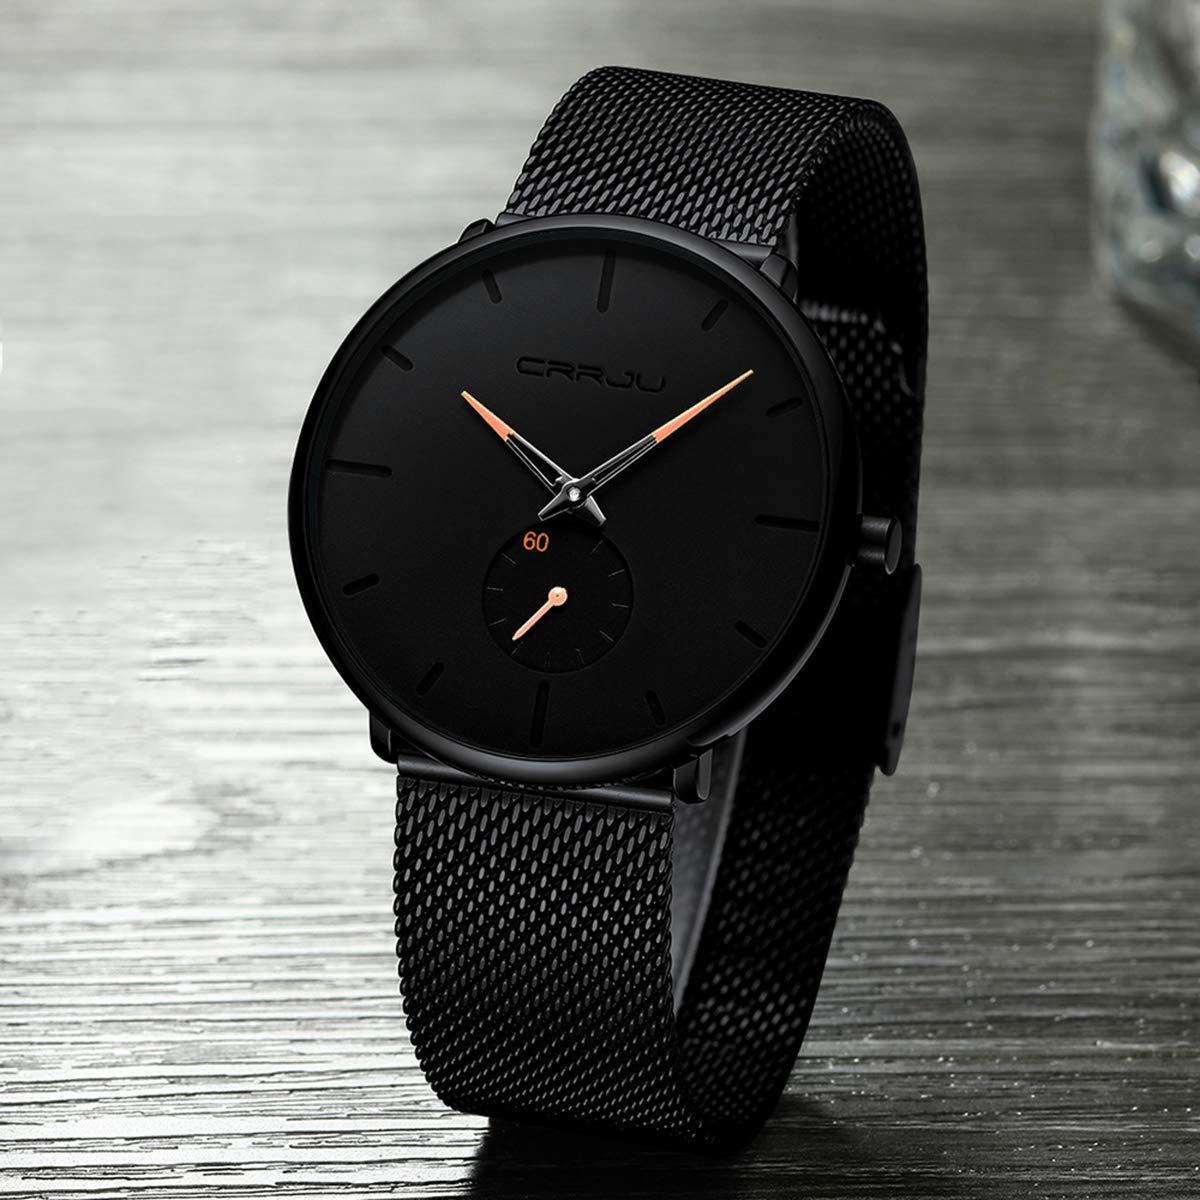 H836608d955b143eab4b7b0b24434a4dah CRRJU Ultra Thin Blue Stainless steel Quartz Watches Men Simple Fashion Business Japan Wristwatch Clock Male Relogio Masculino